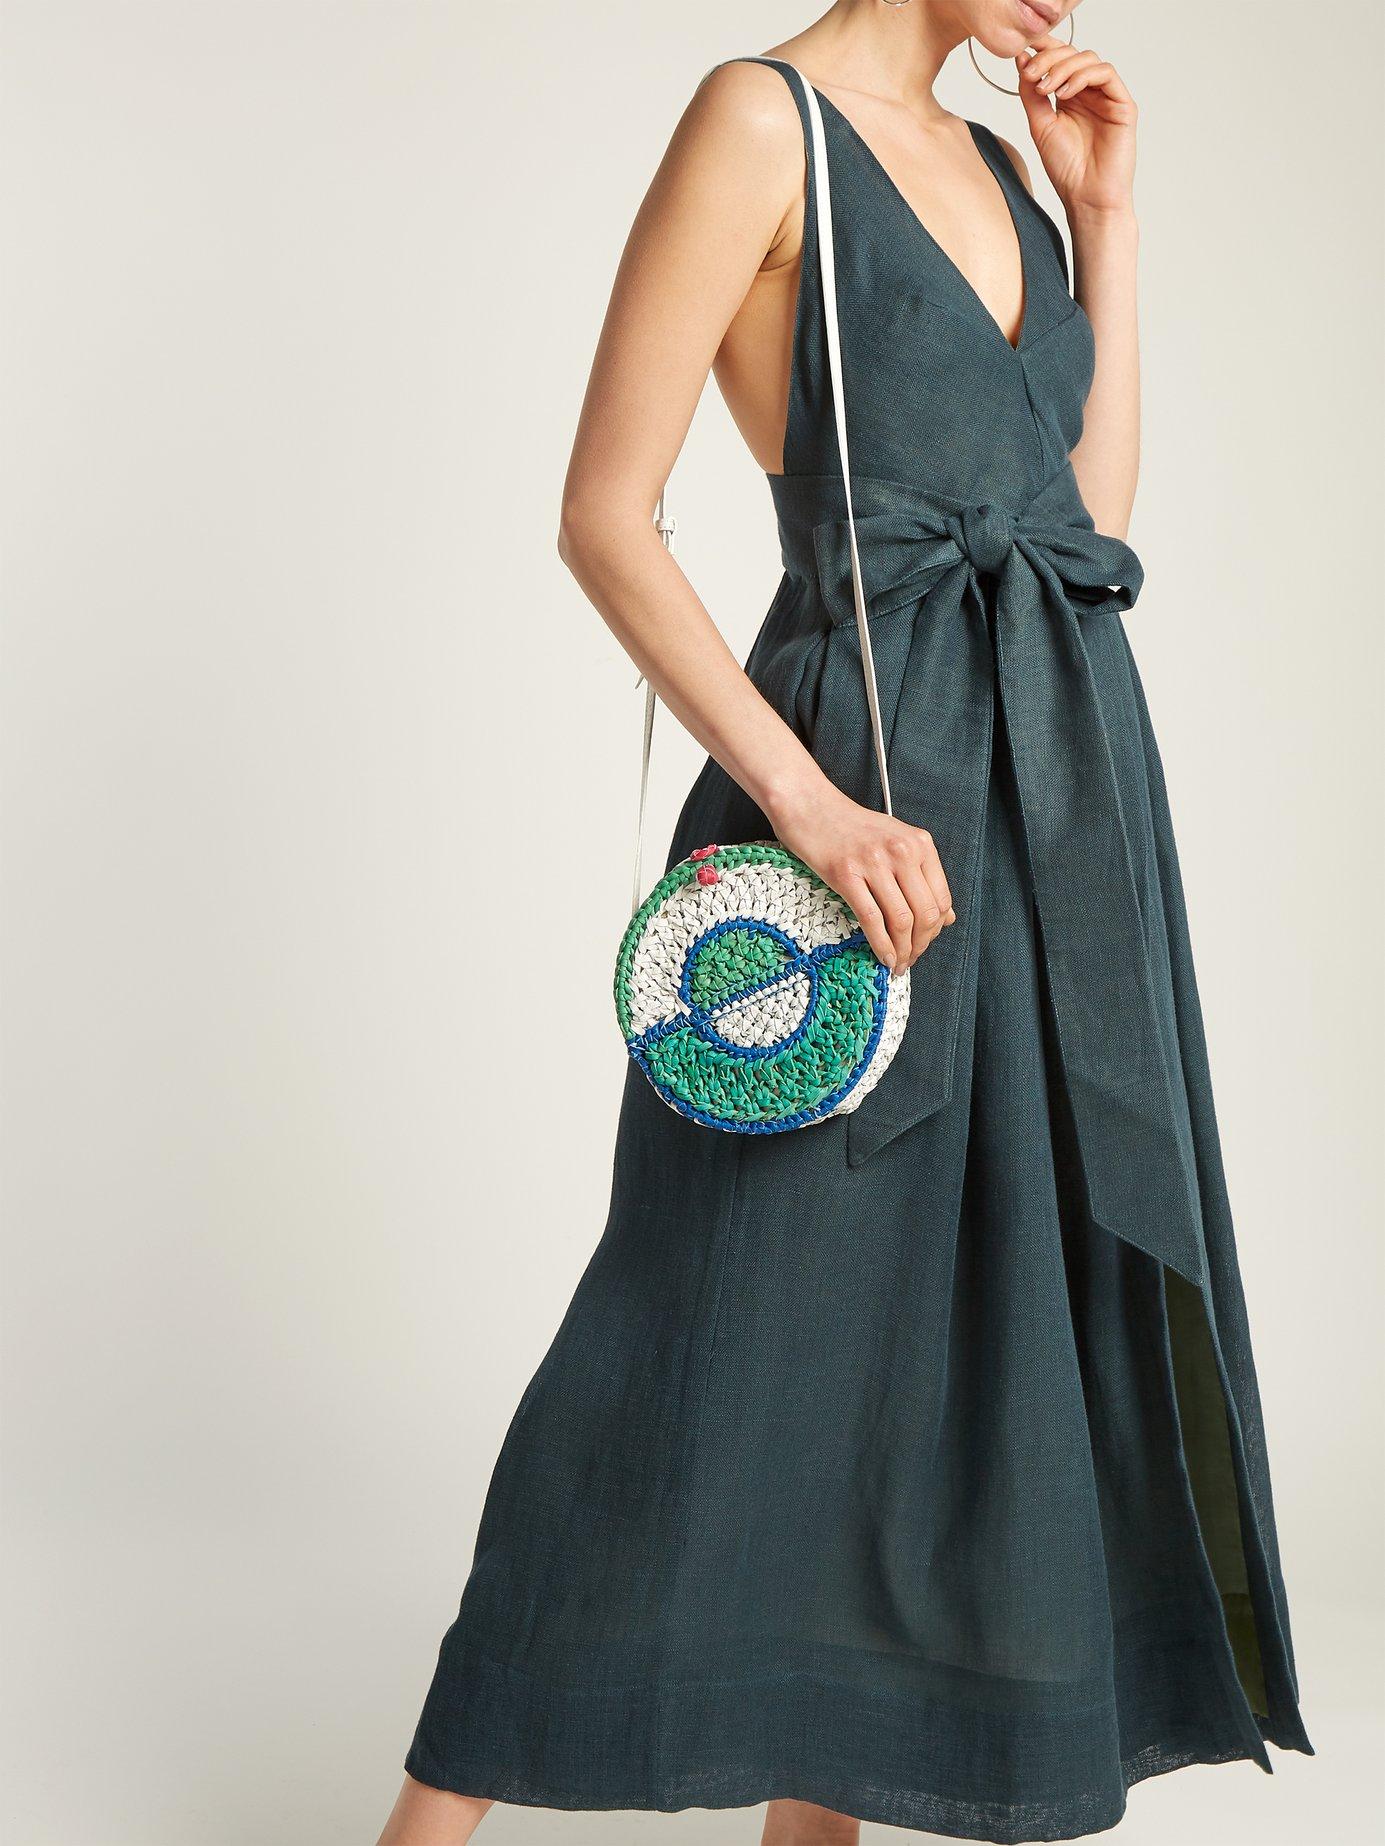 Poet by the Sea tie-waist linen dress by Kalita